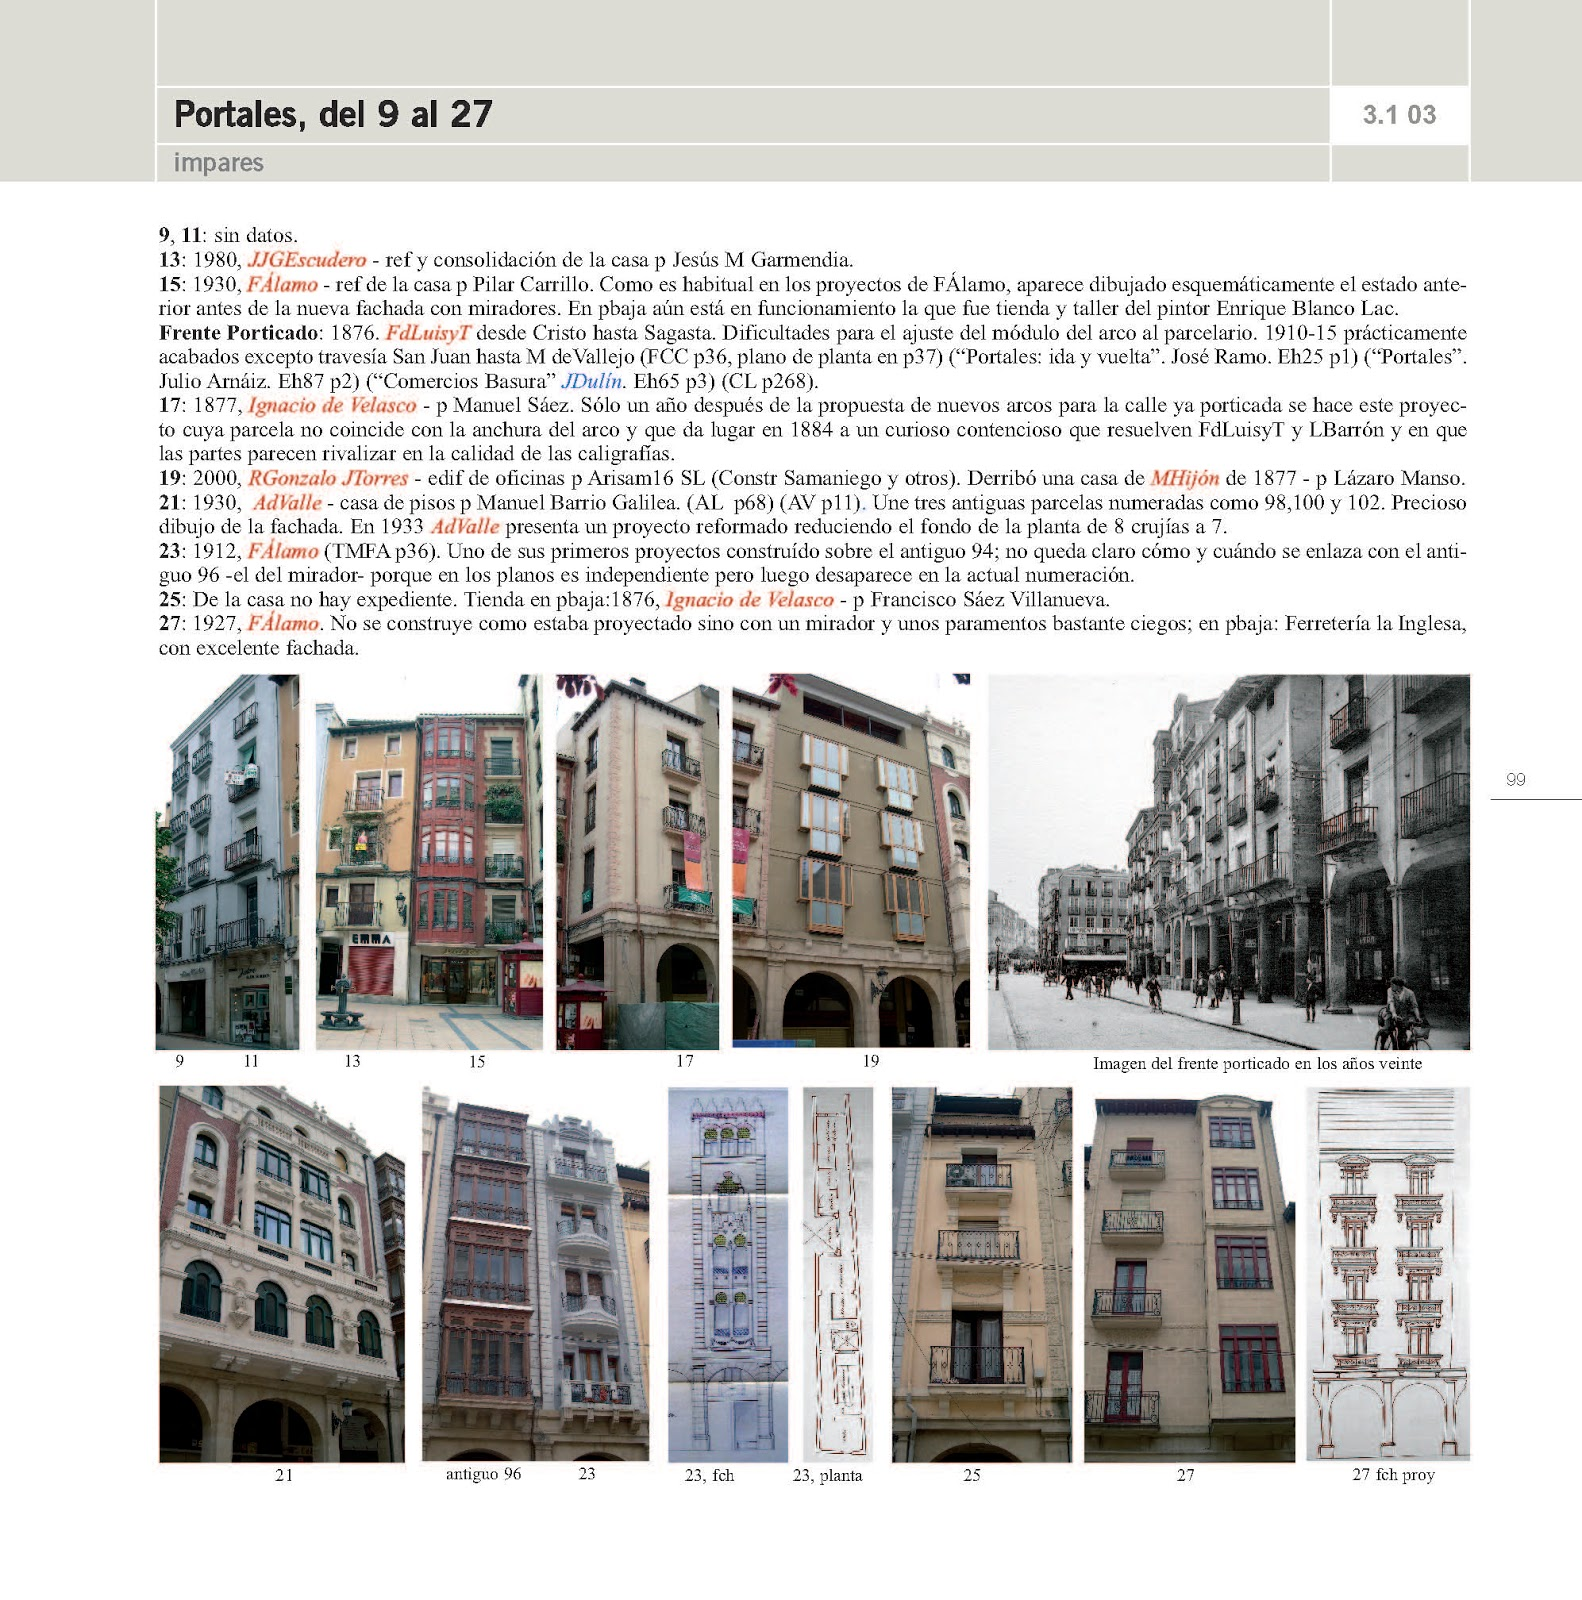 Guia De Arquitectura De Logro O Paginas 3 1 03 Portales